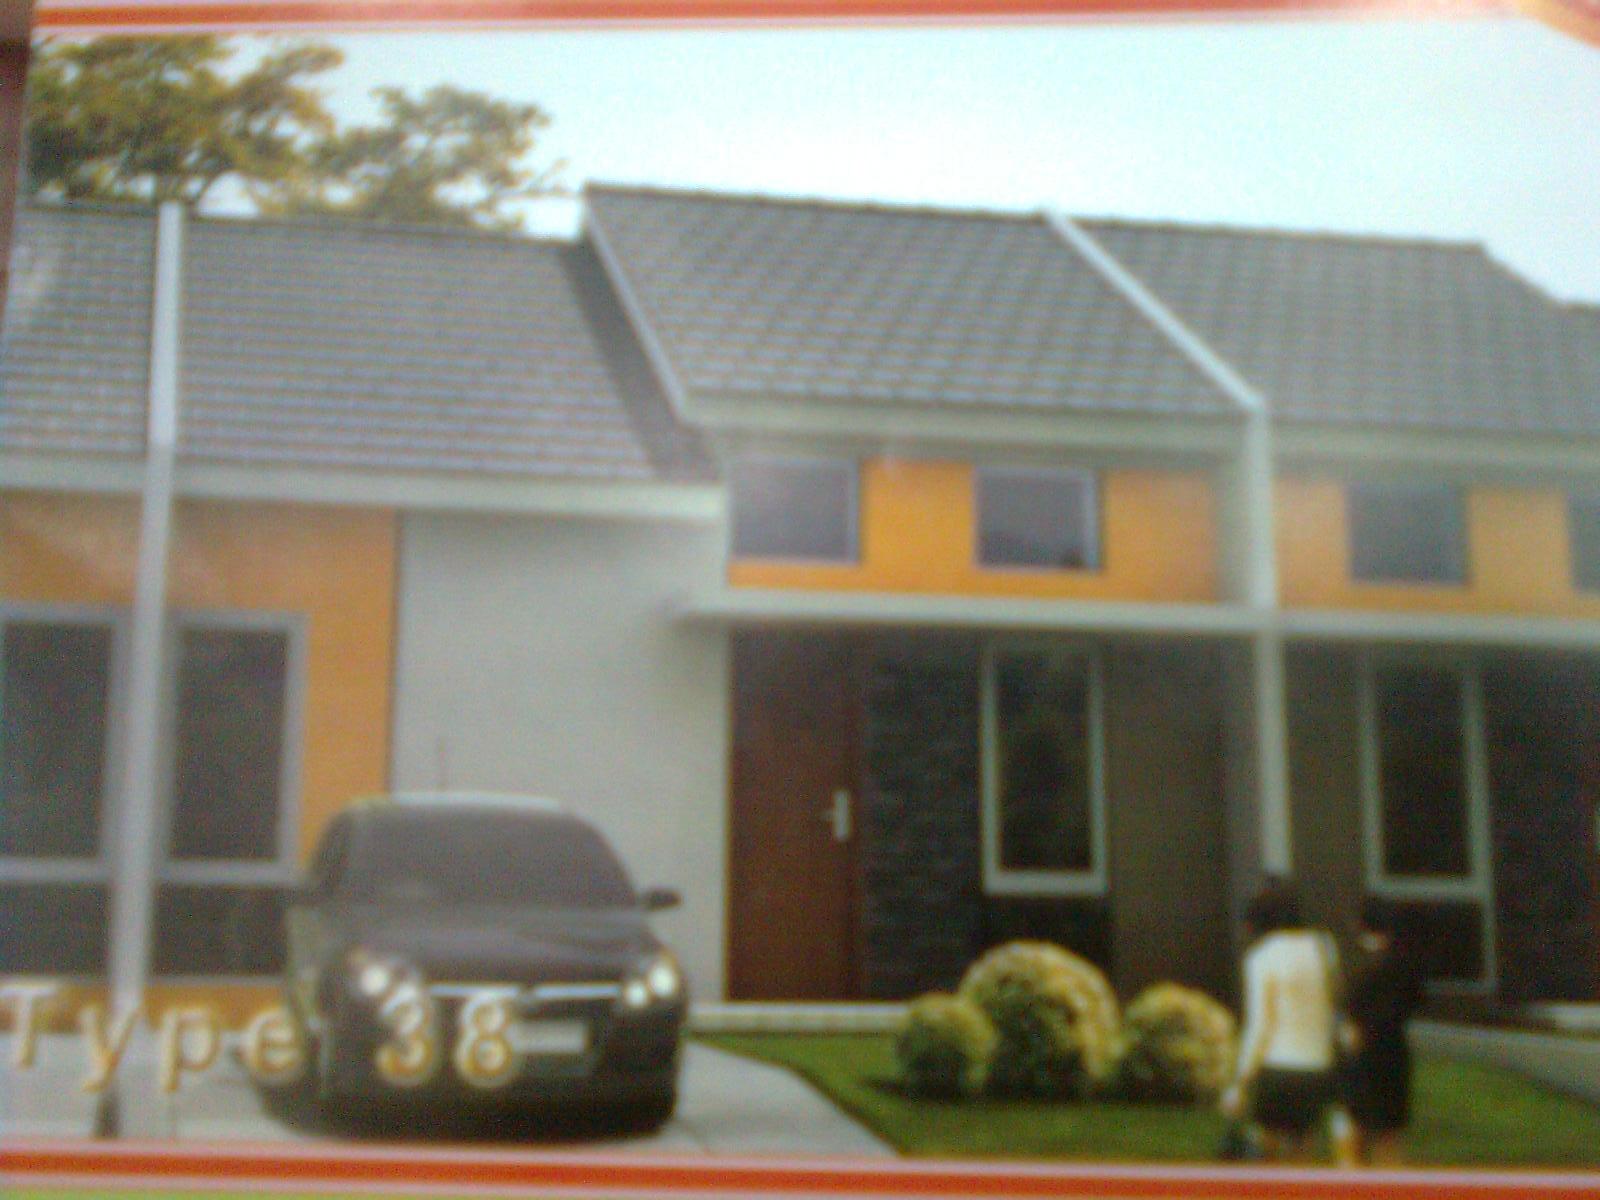 Pantai_Gading_Residence_Type_38.jpg